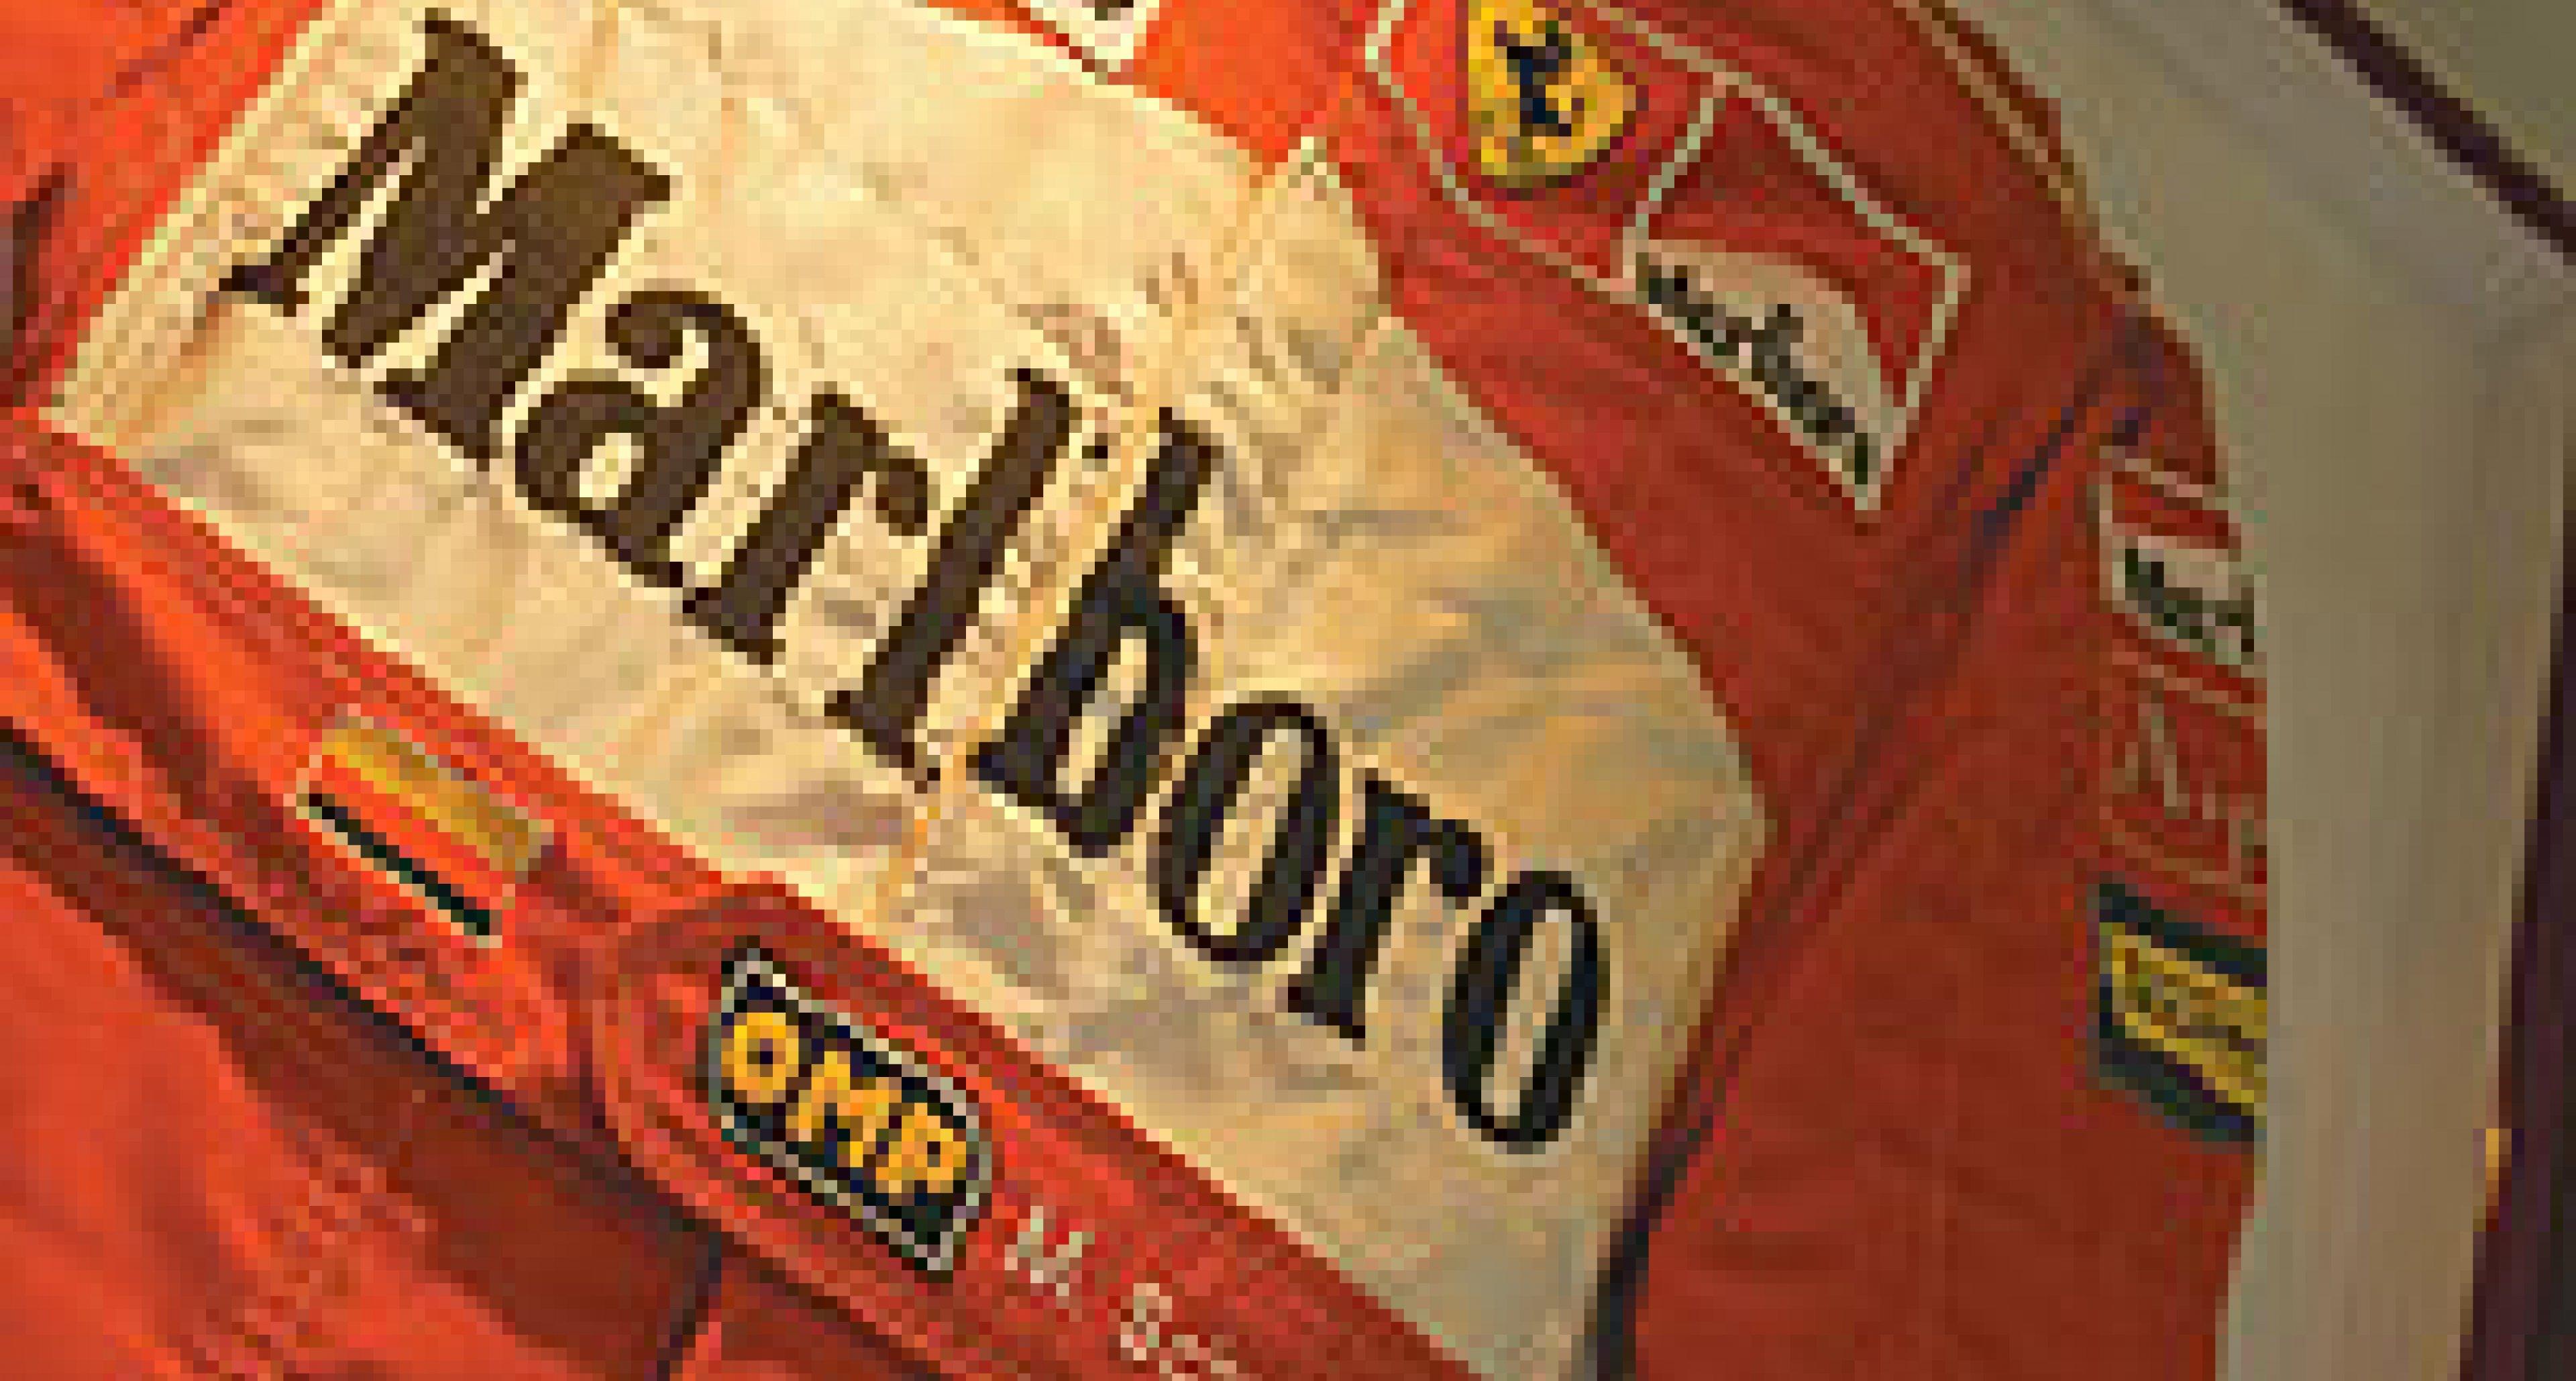 Fiorano Ferrari